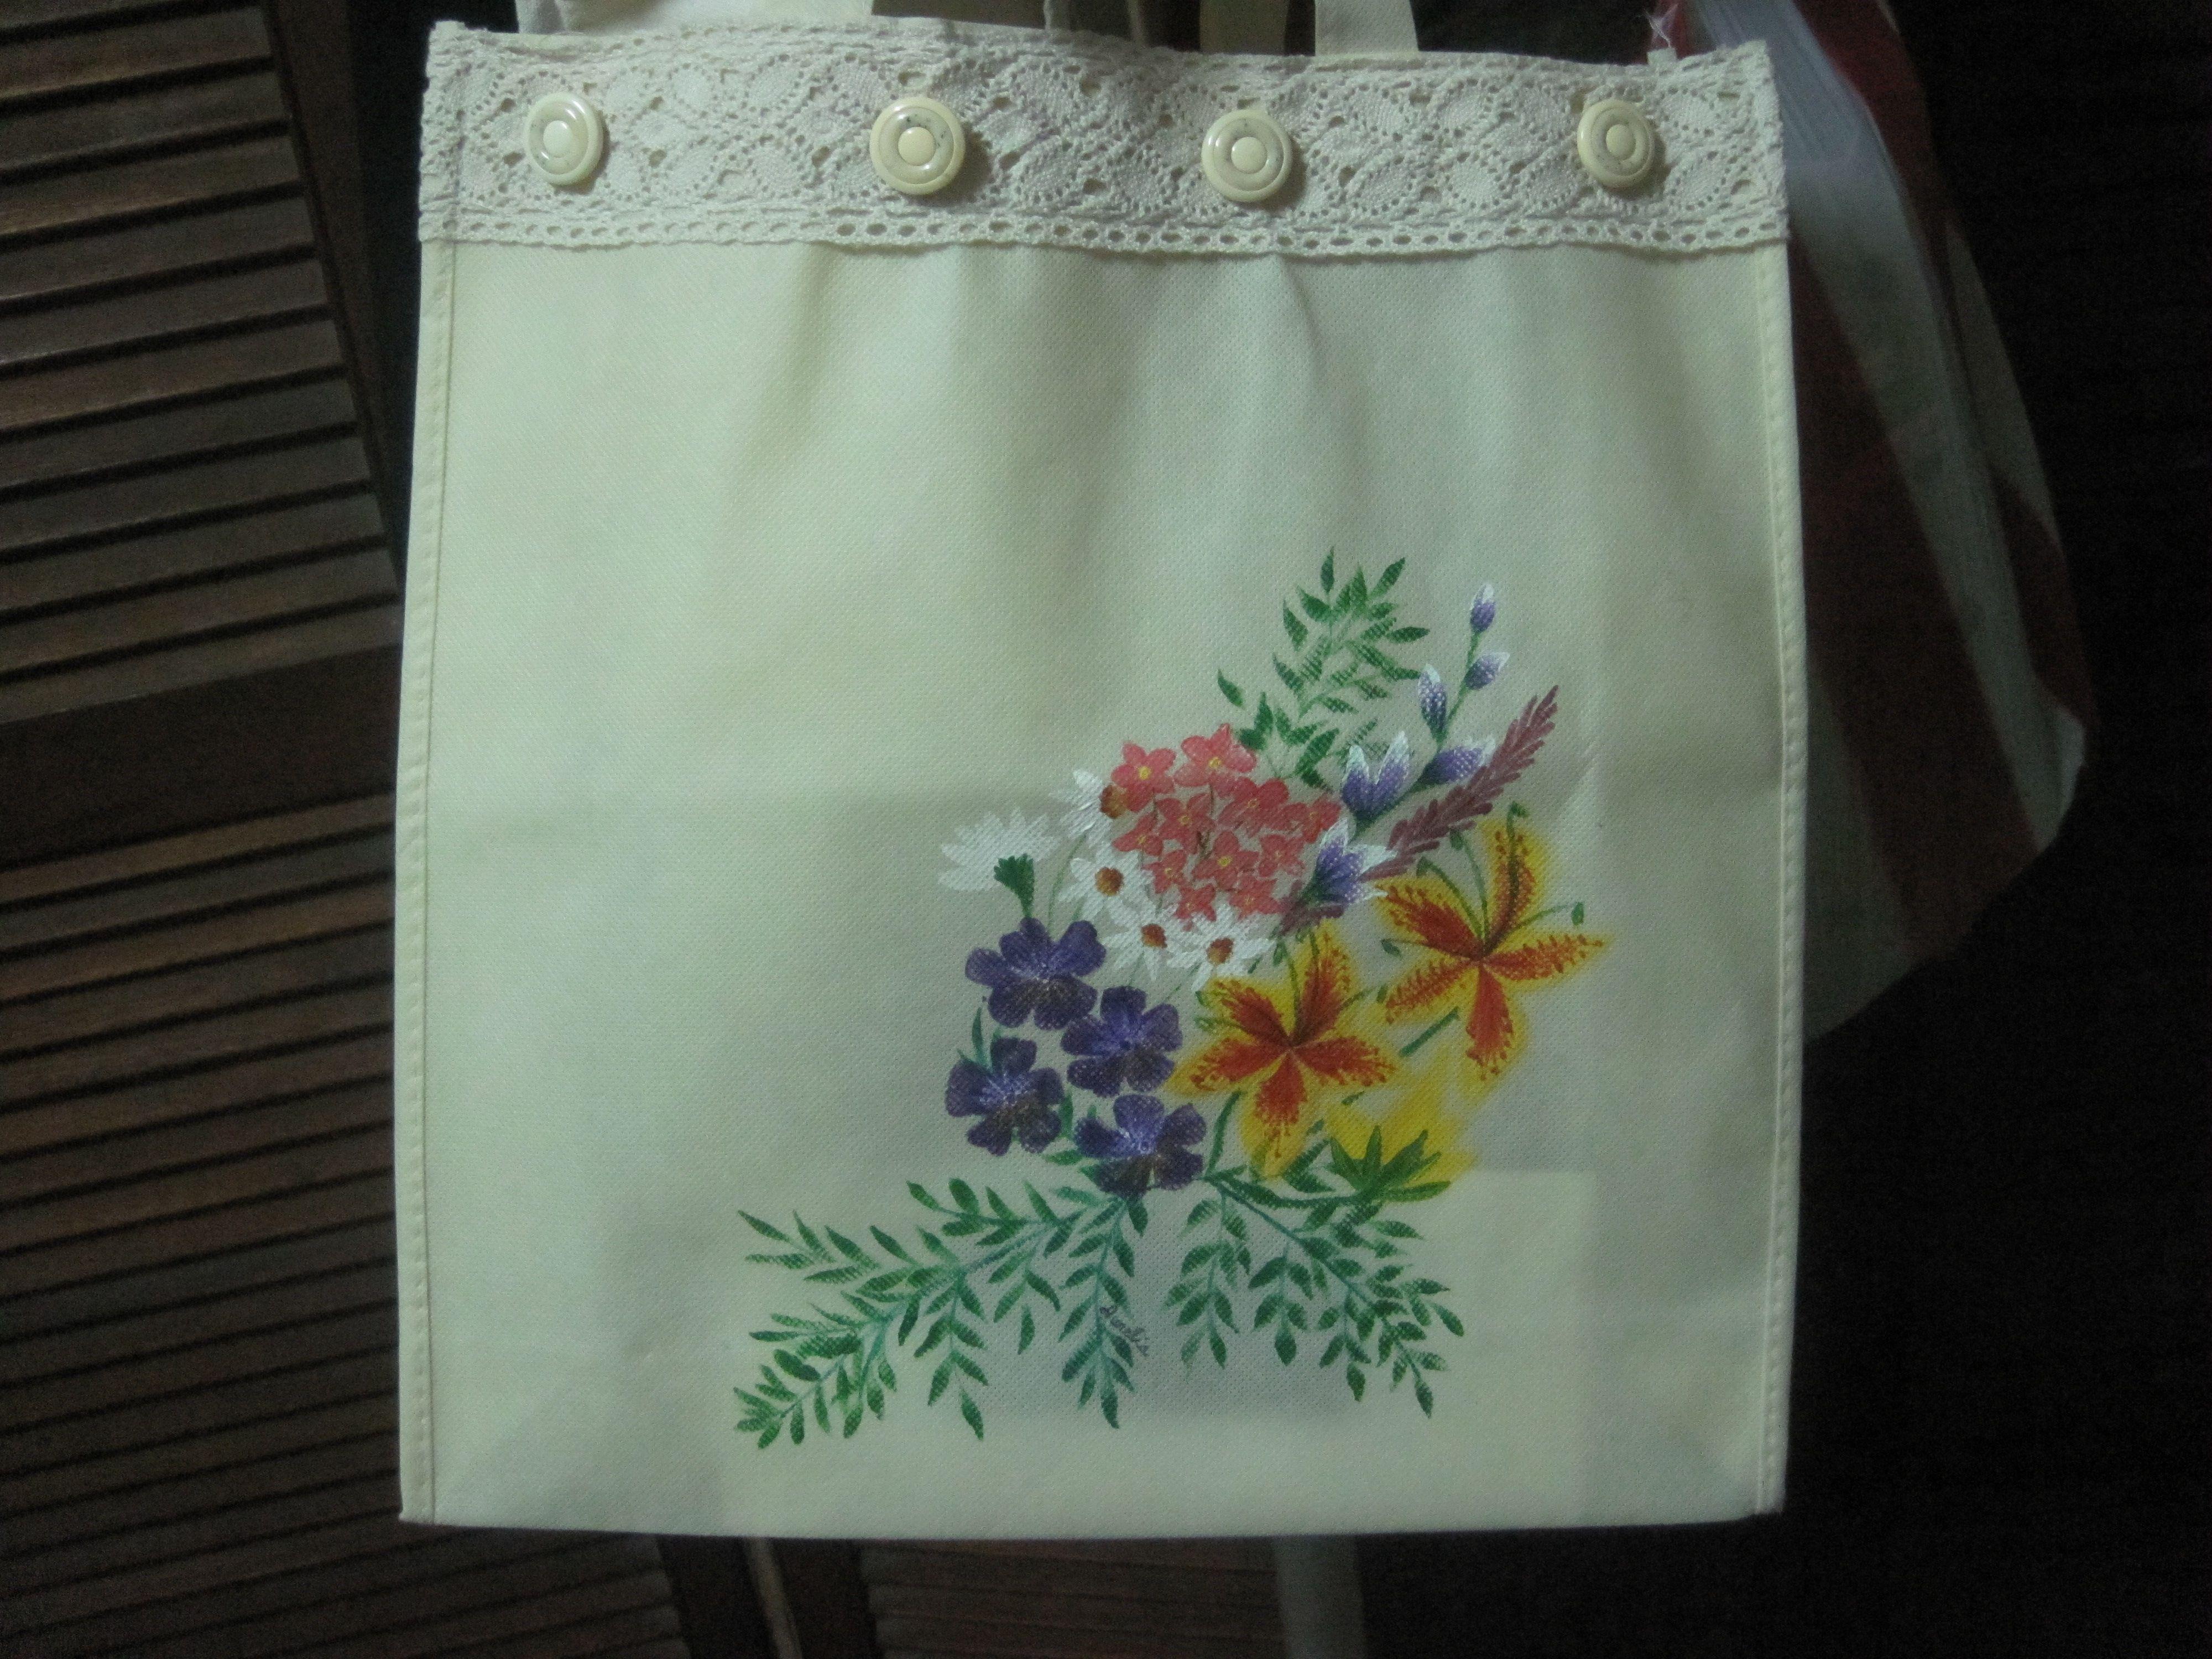 Flora theme on canvas bag.